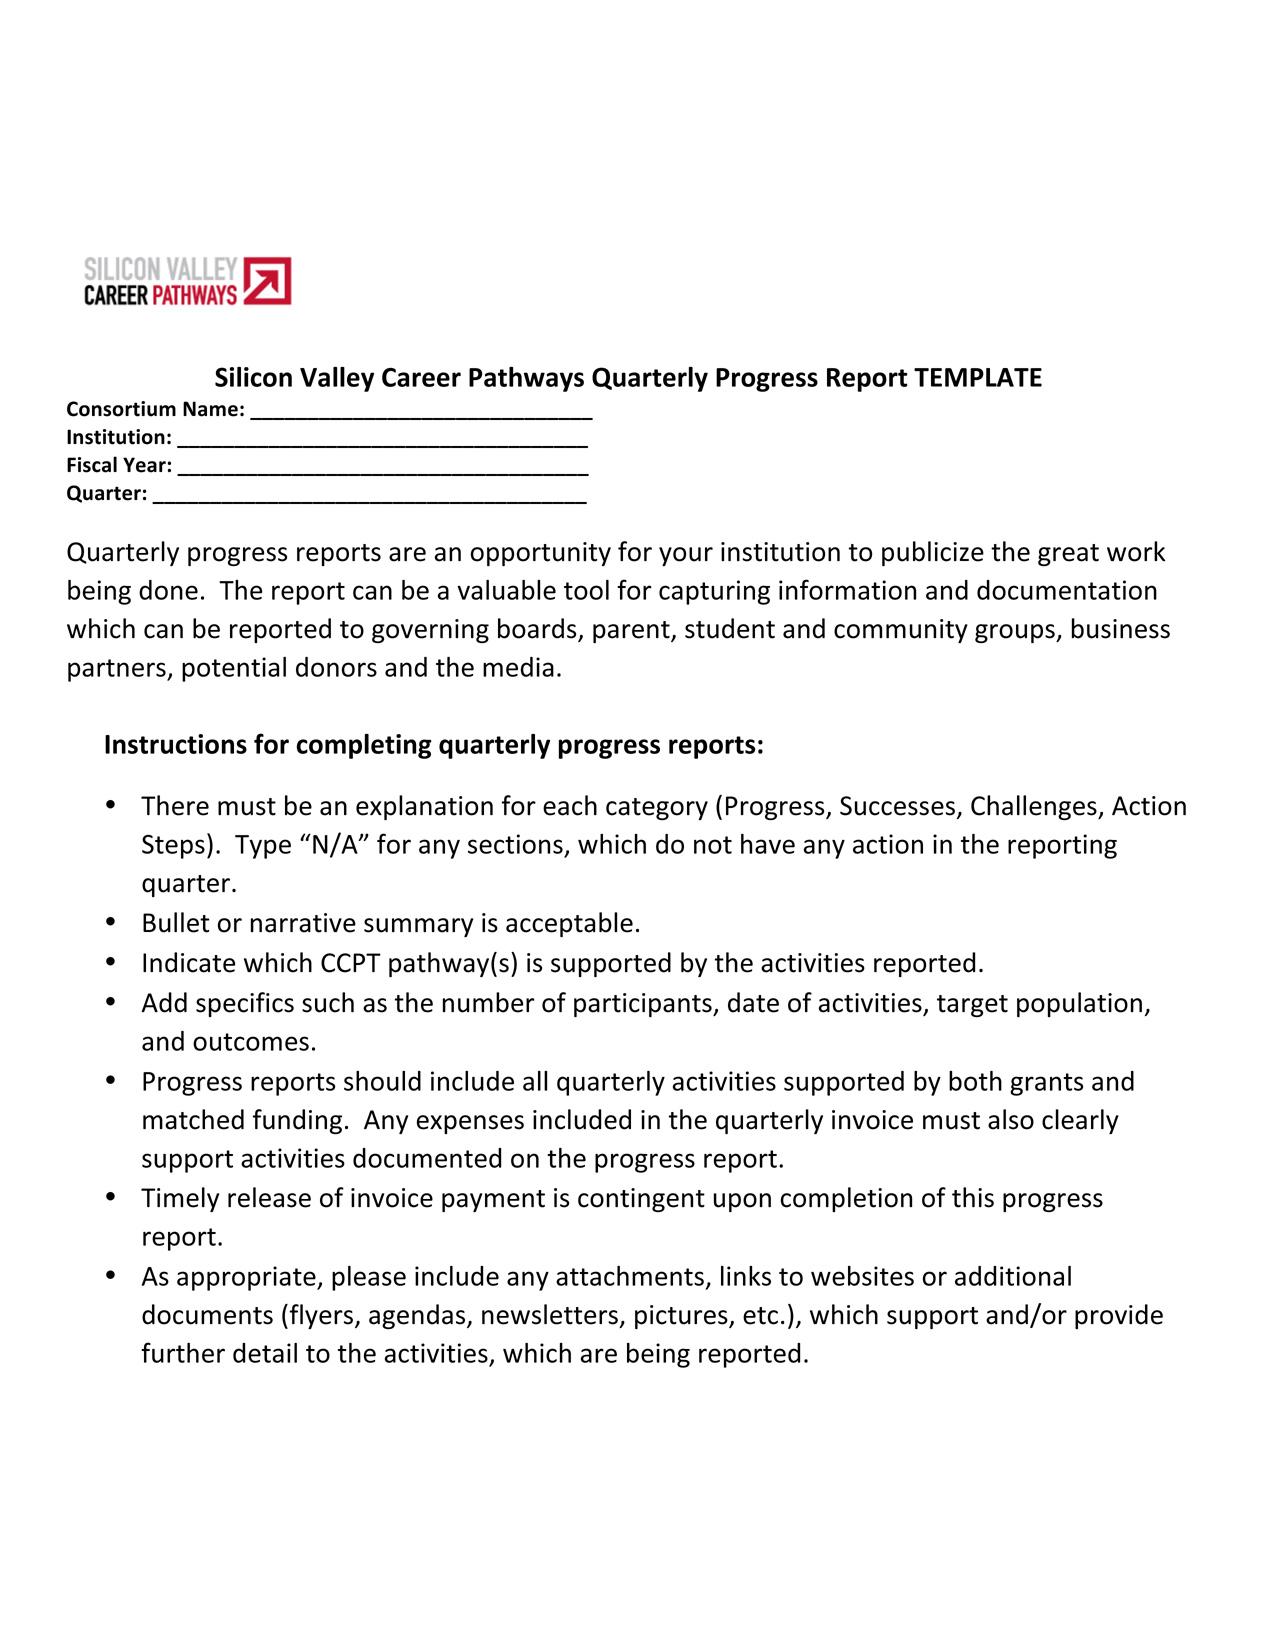 SVCP-Quarterly-Progress-Report-Template-1.jpg